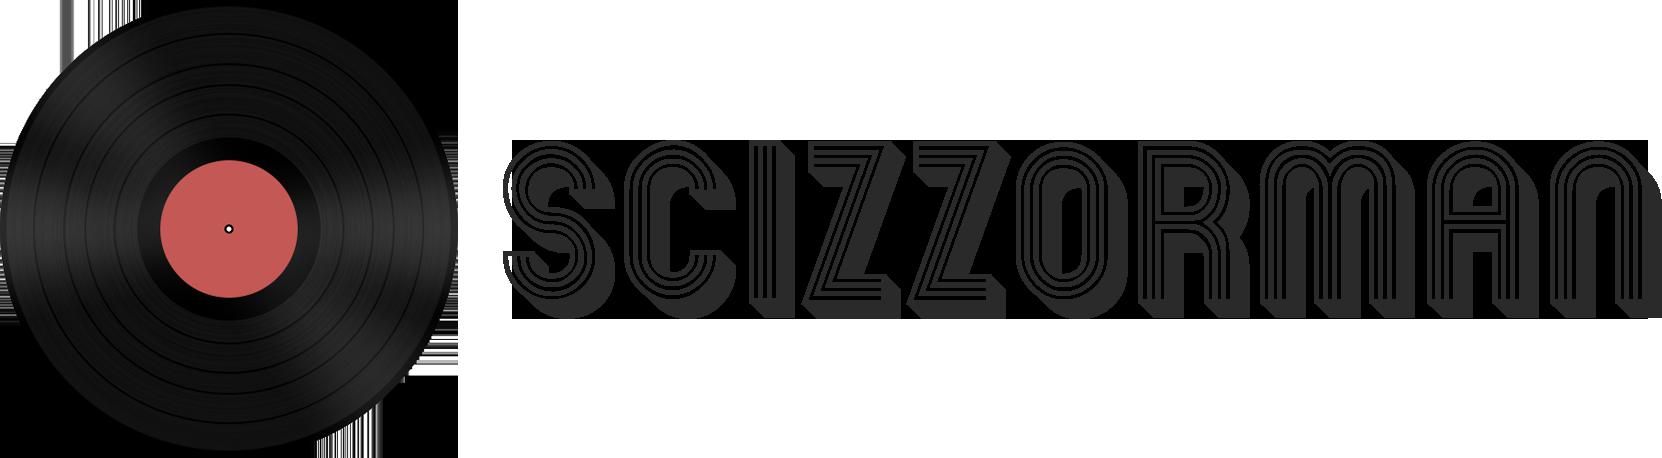 Scizzorman